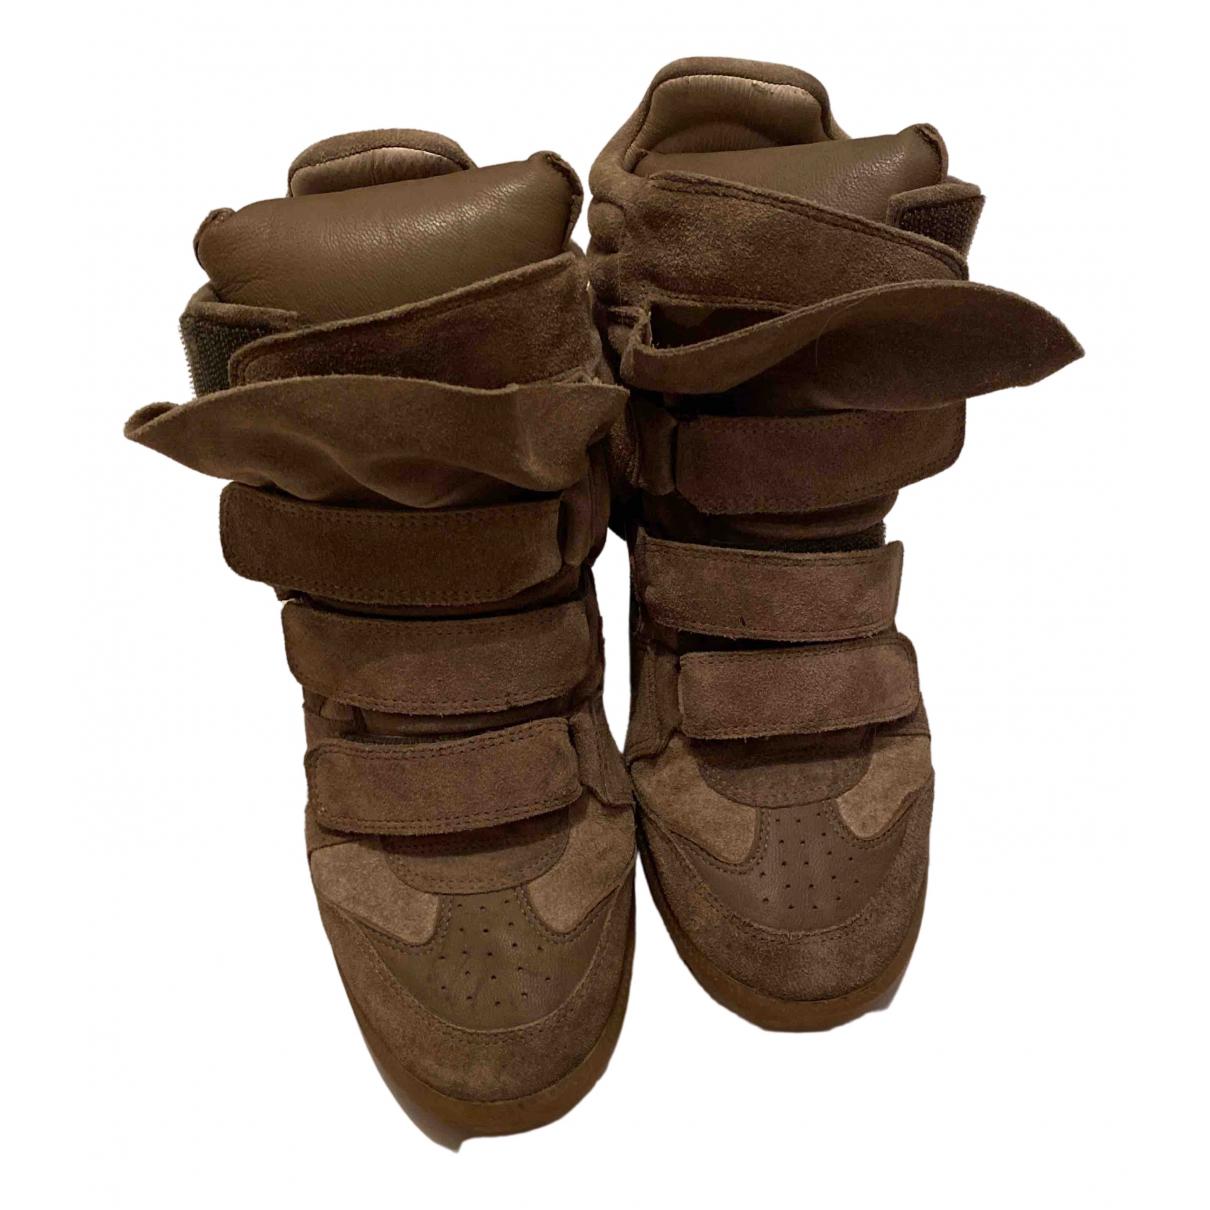 Isabel Marant - Baskets   pour femme en cuir - beige